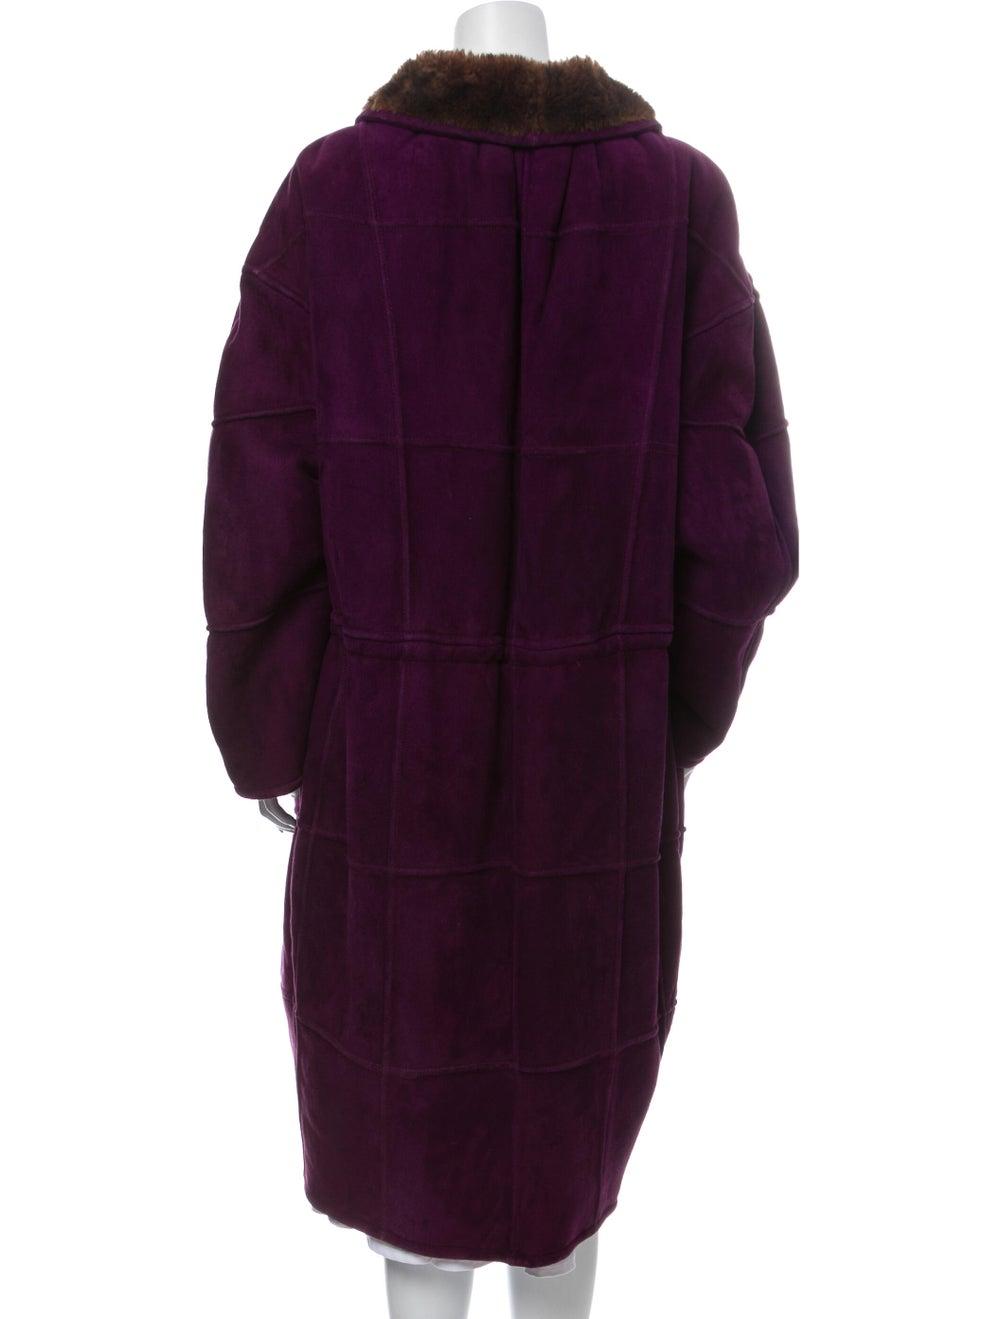 Krizia Coat Purple - image 3